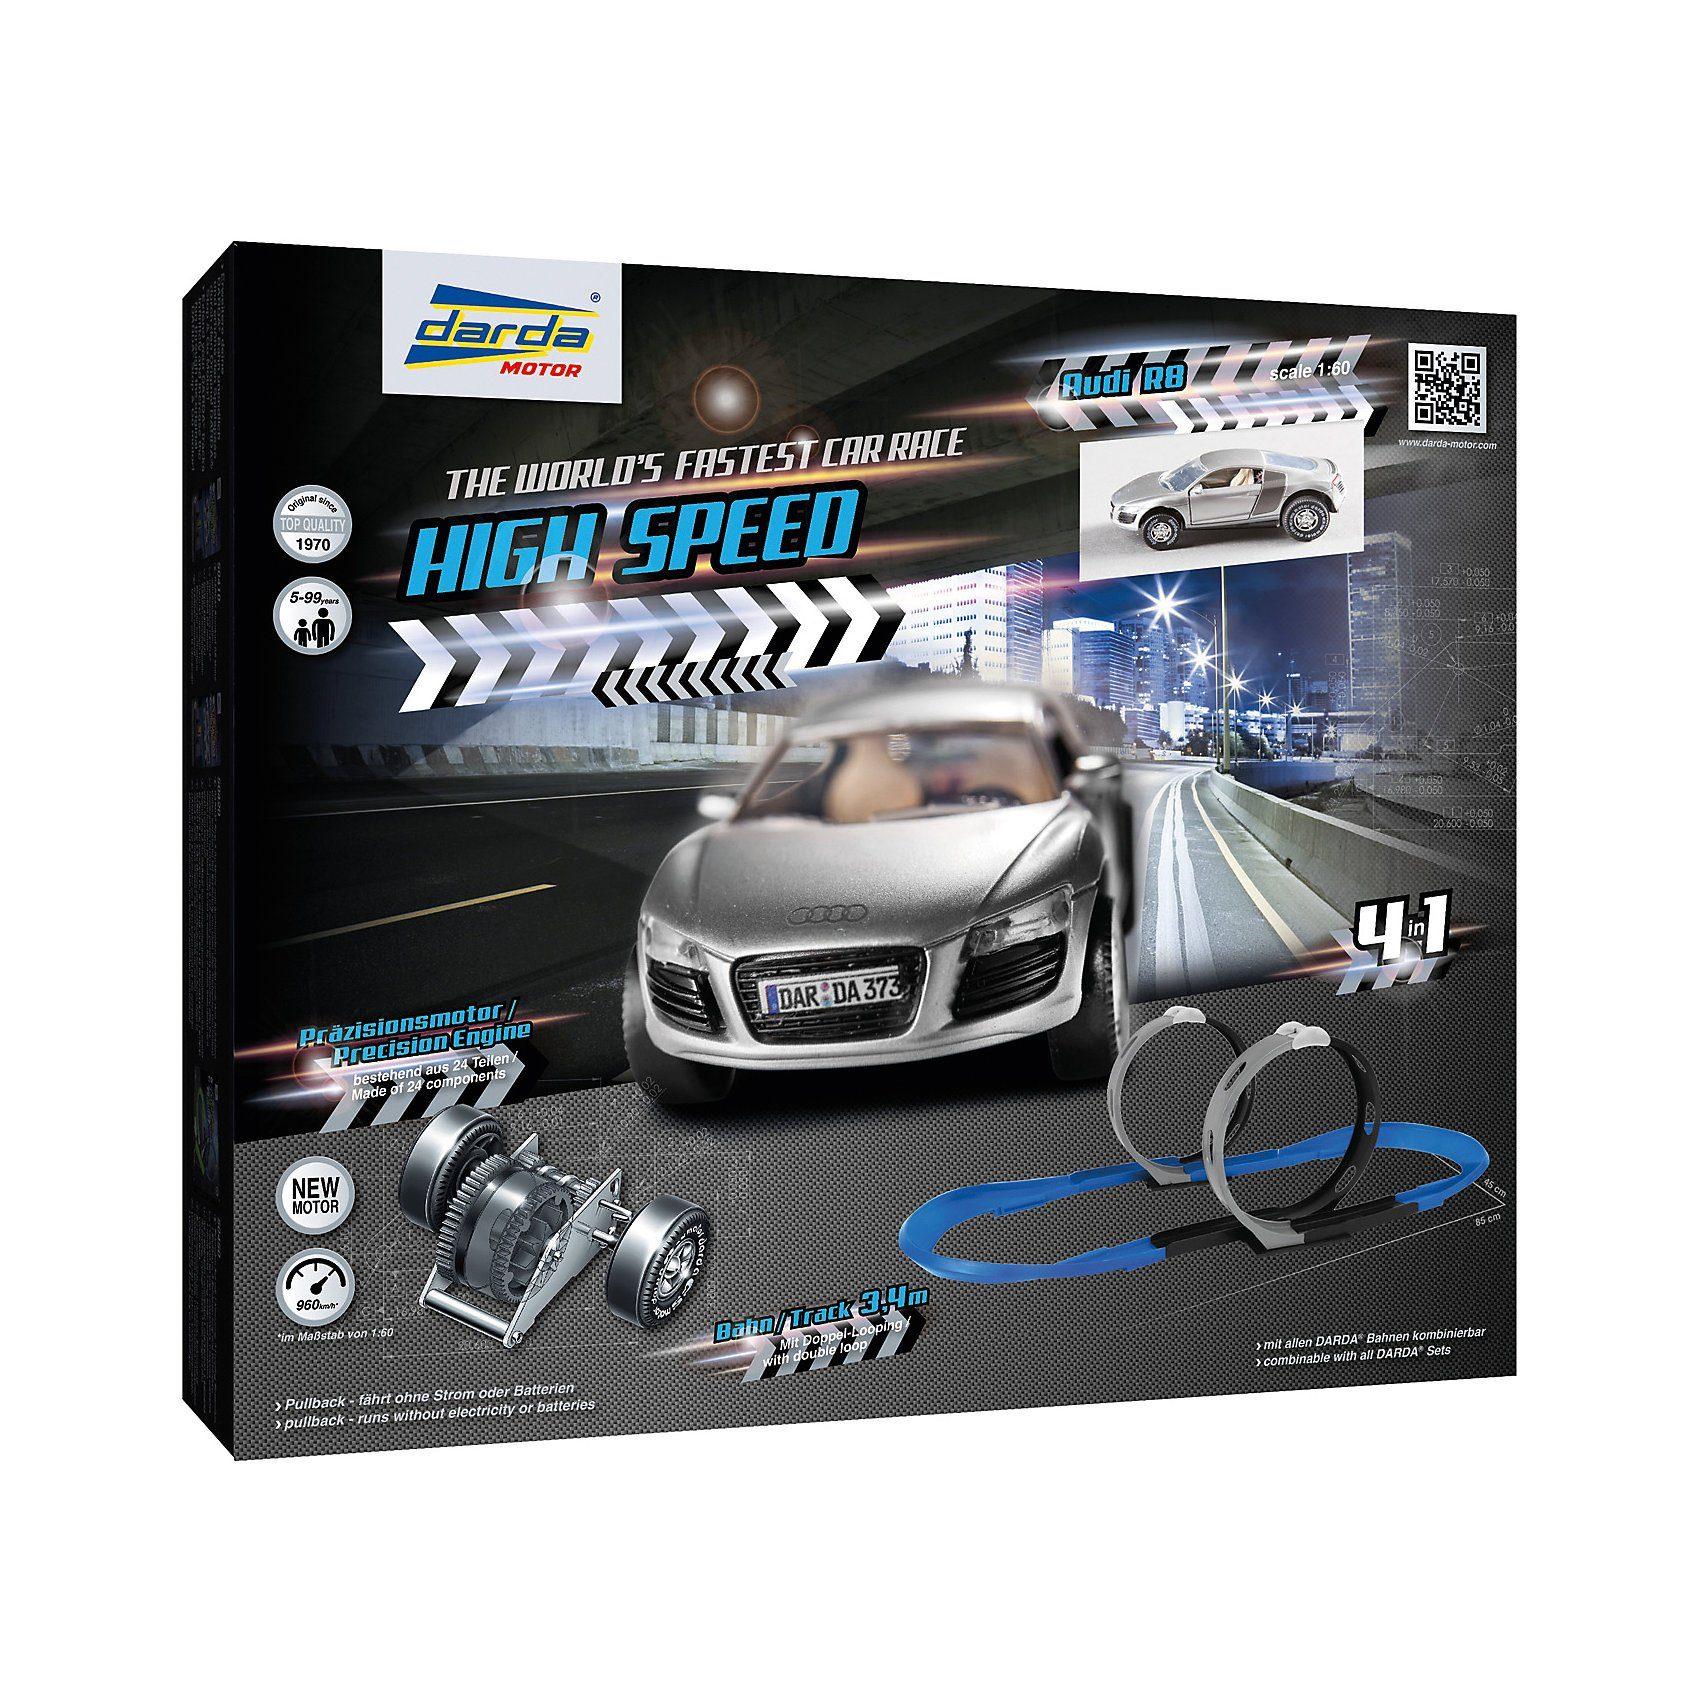 Darda® Motor High Speed